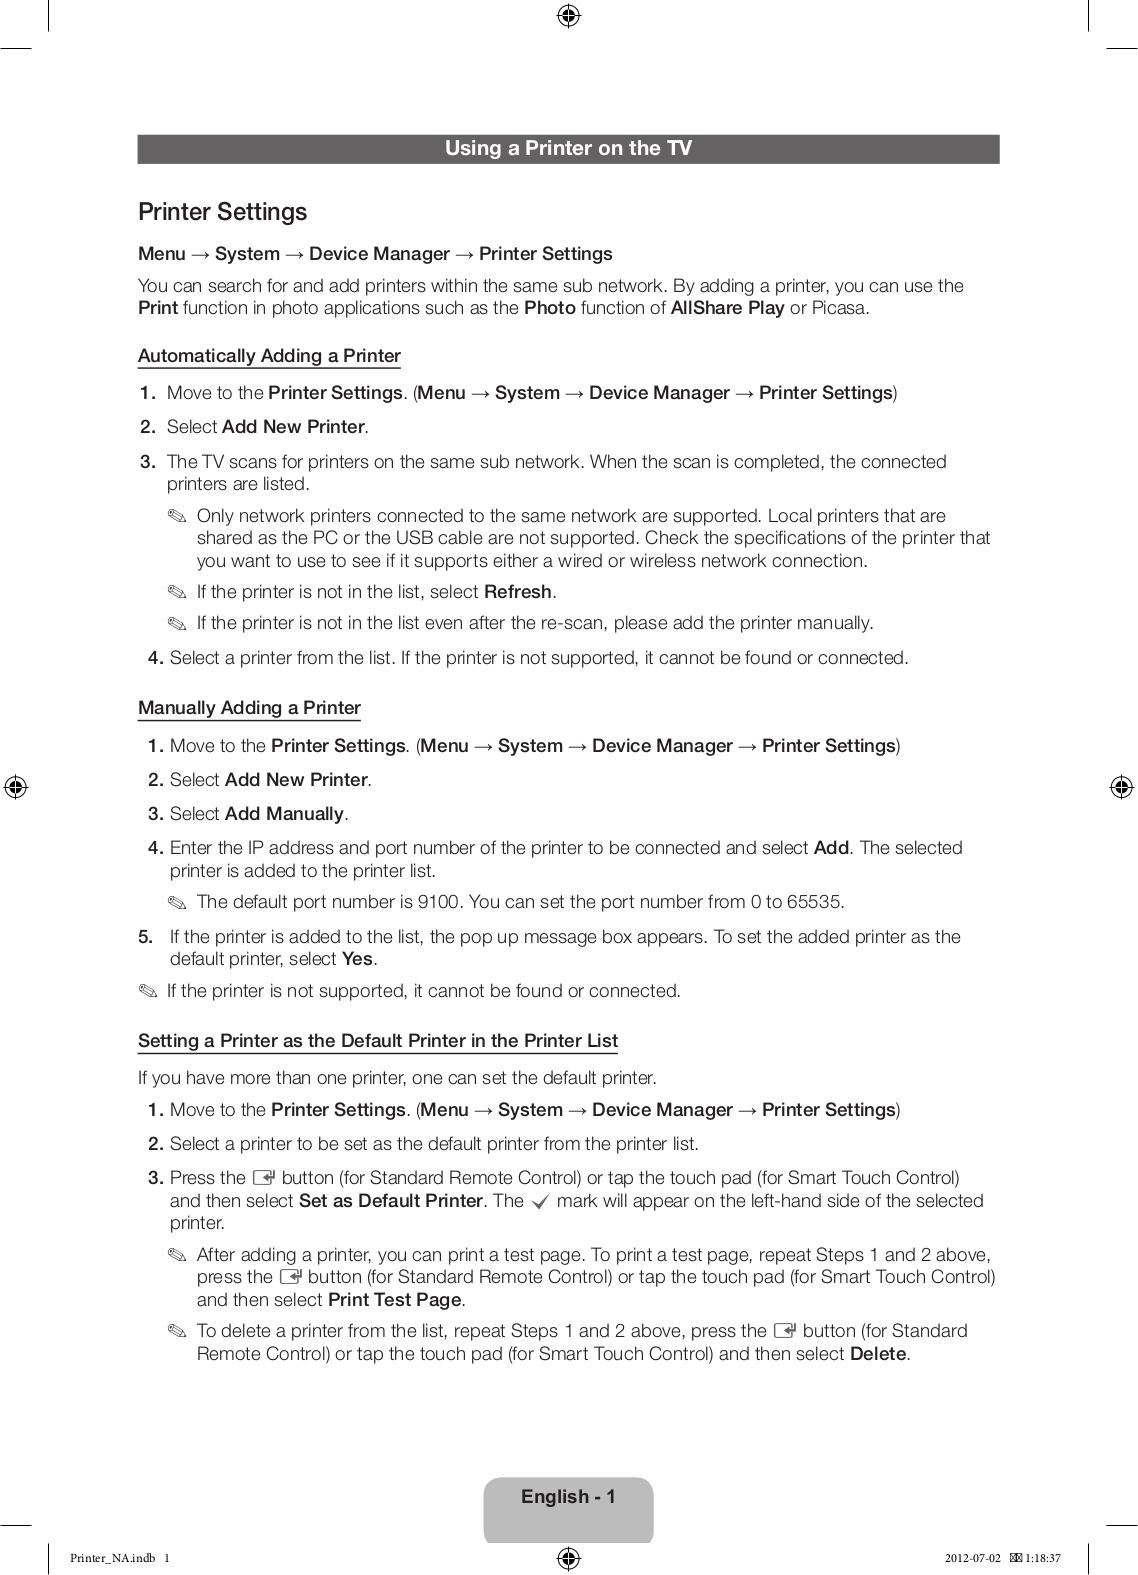 Dodge nitro factory service manual